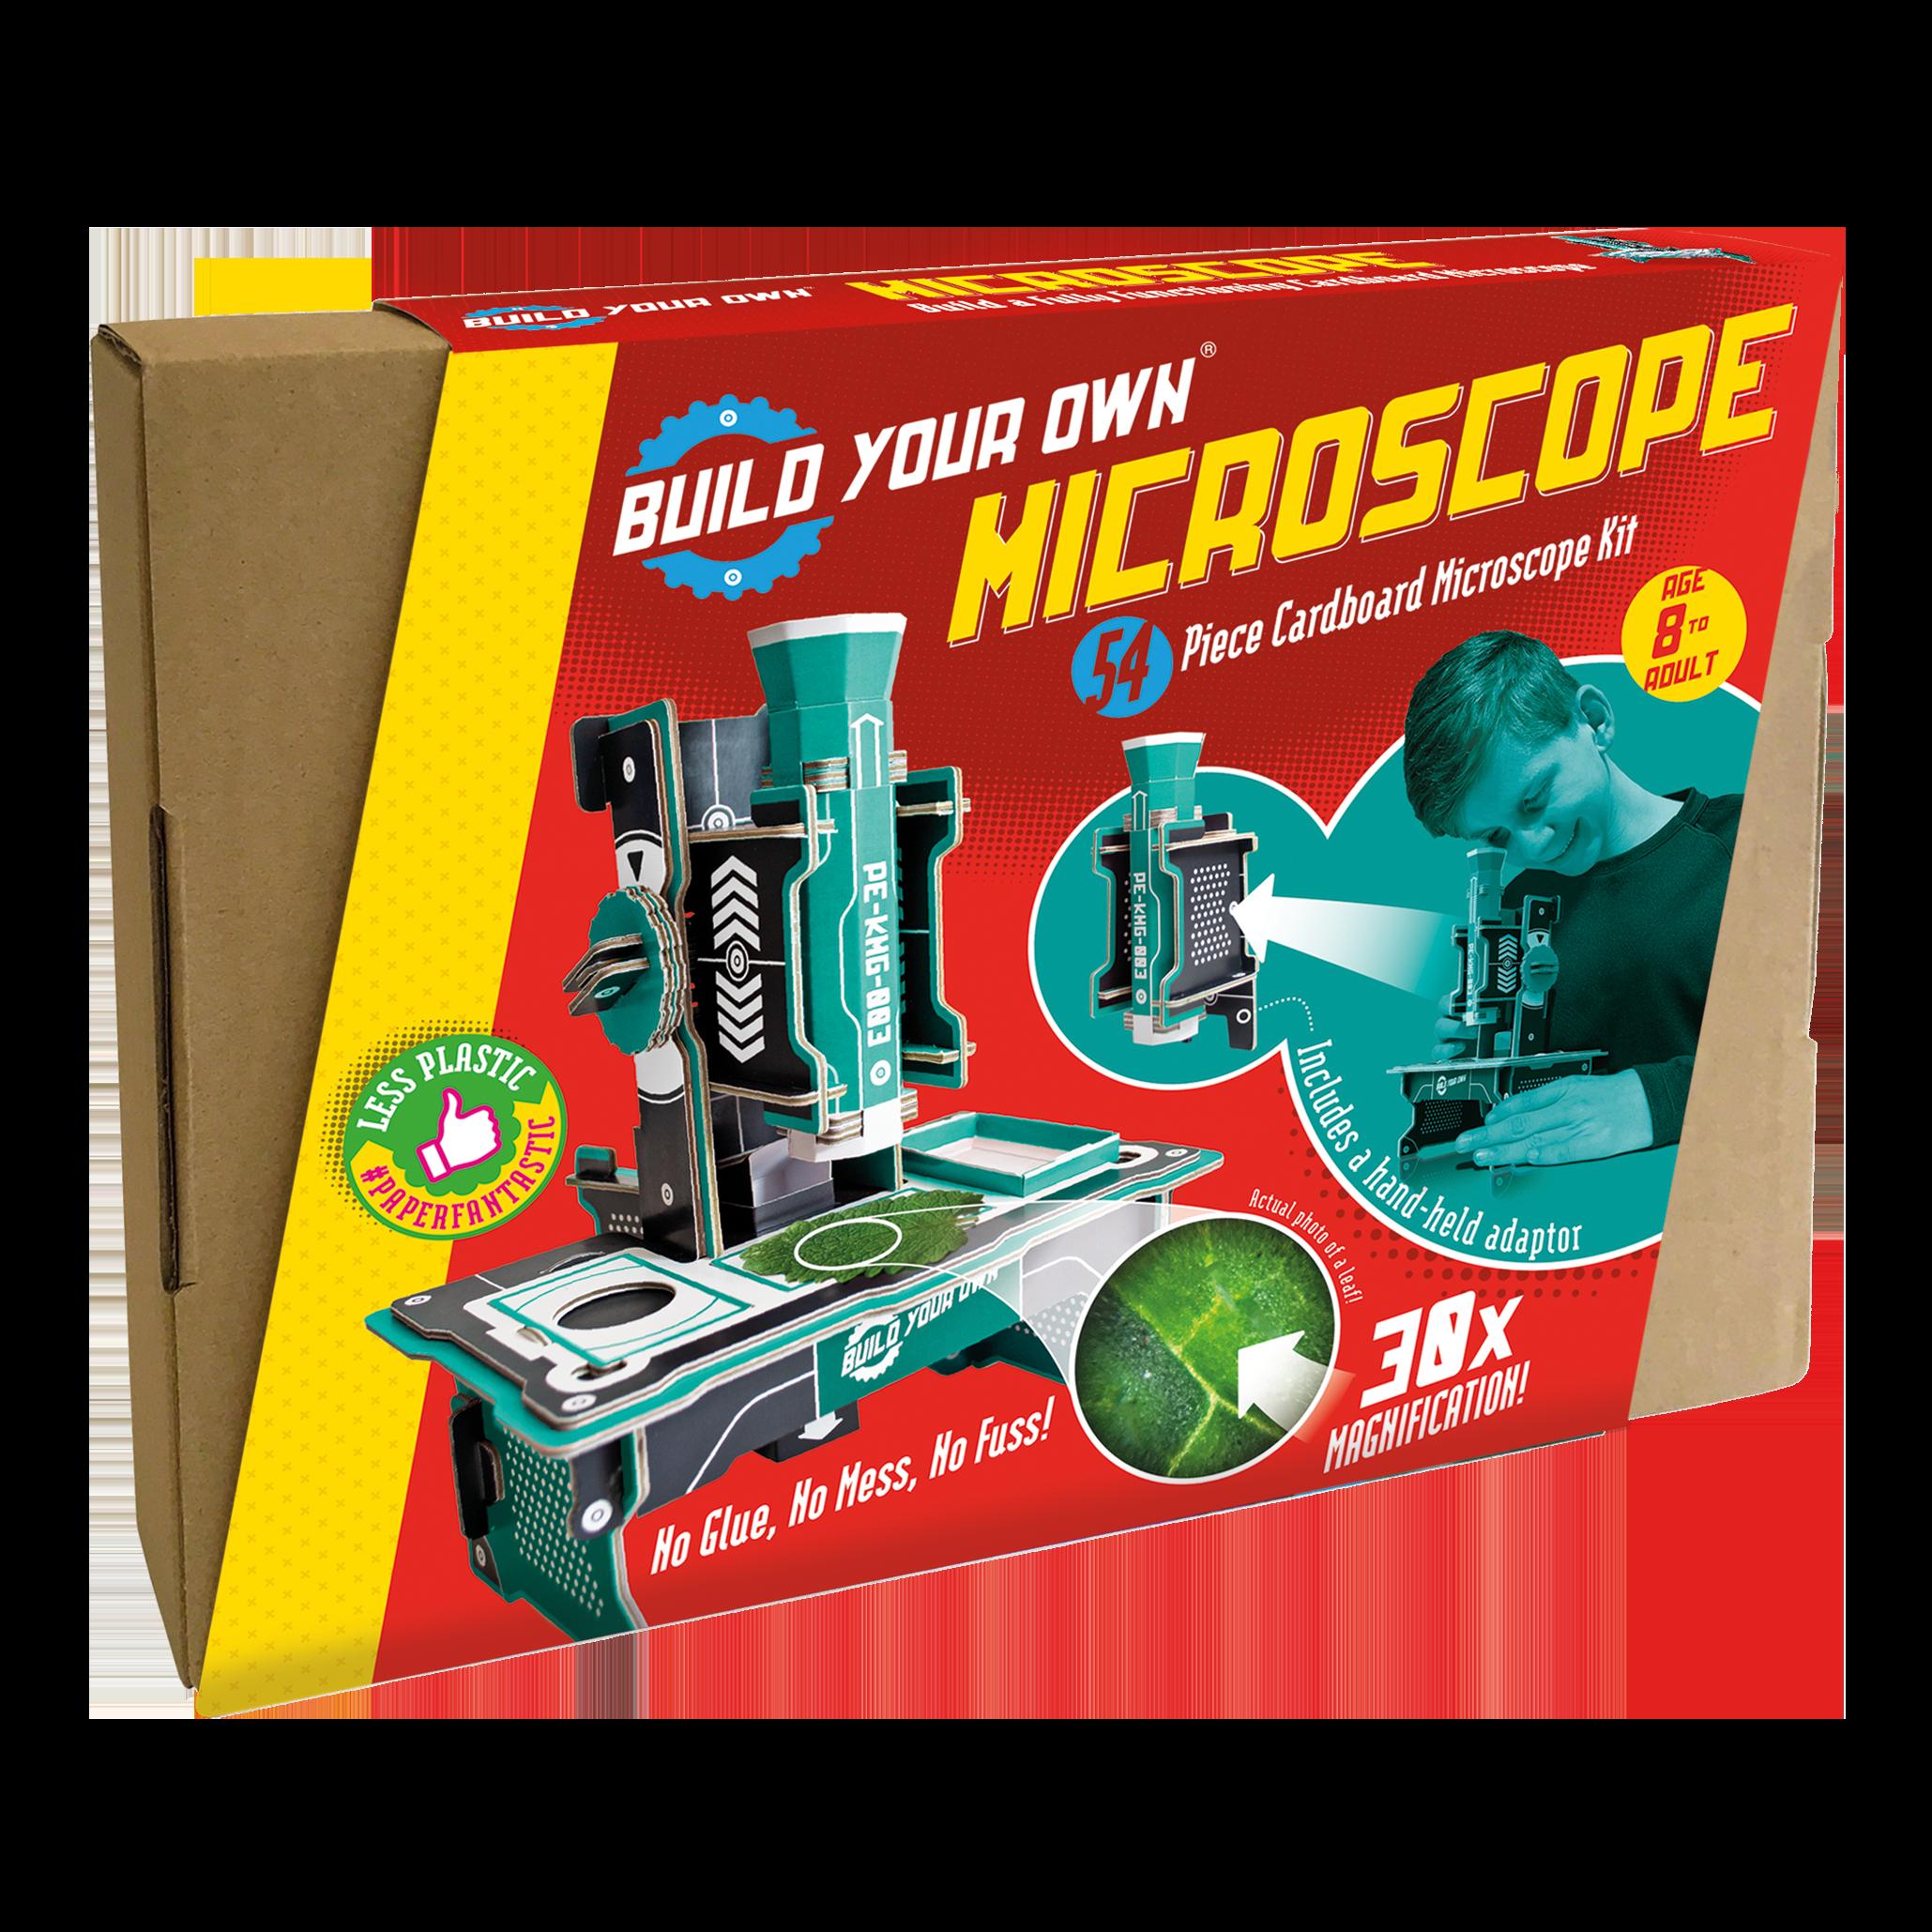 BYO Microscope